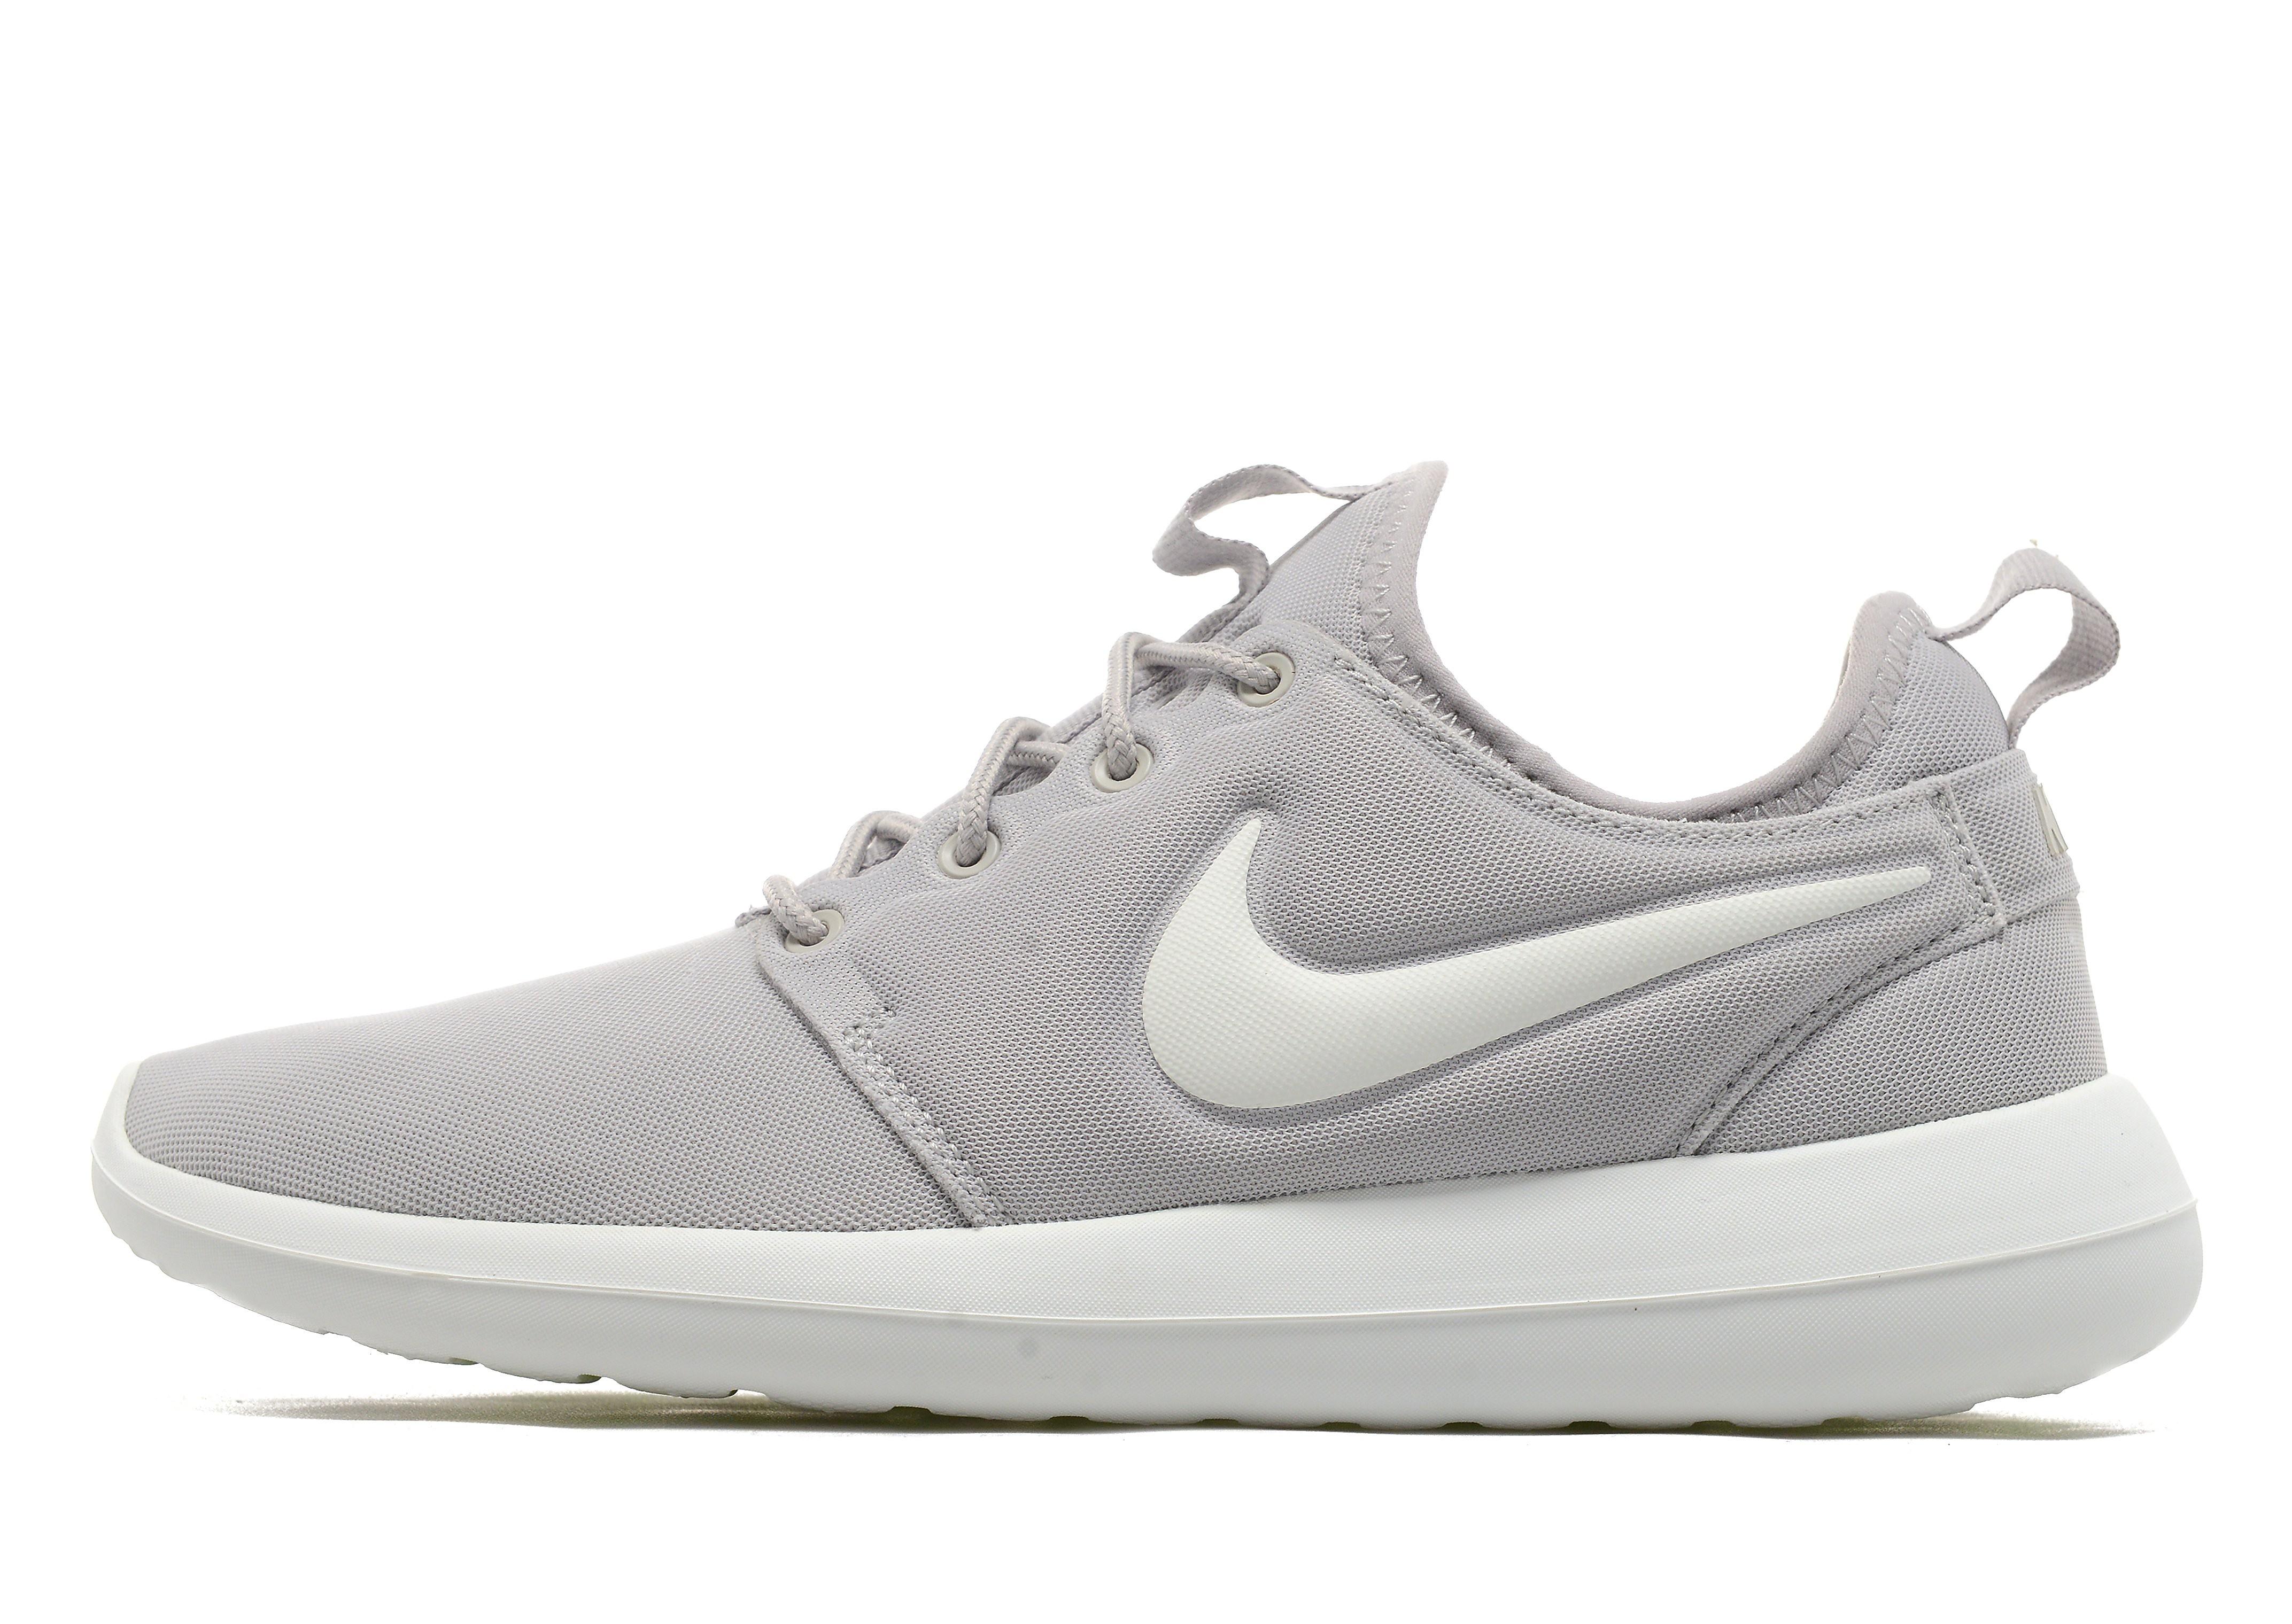 etiqueta Cartero Muslo  Nike Roshe 2 Women's - Grey - Womens - Sports King Store